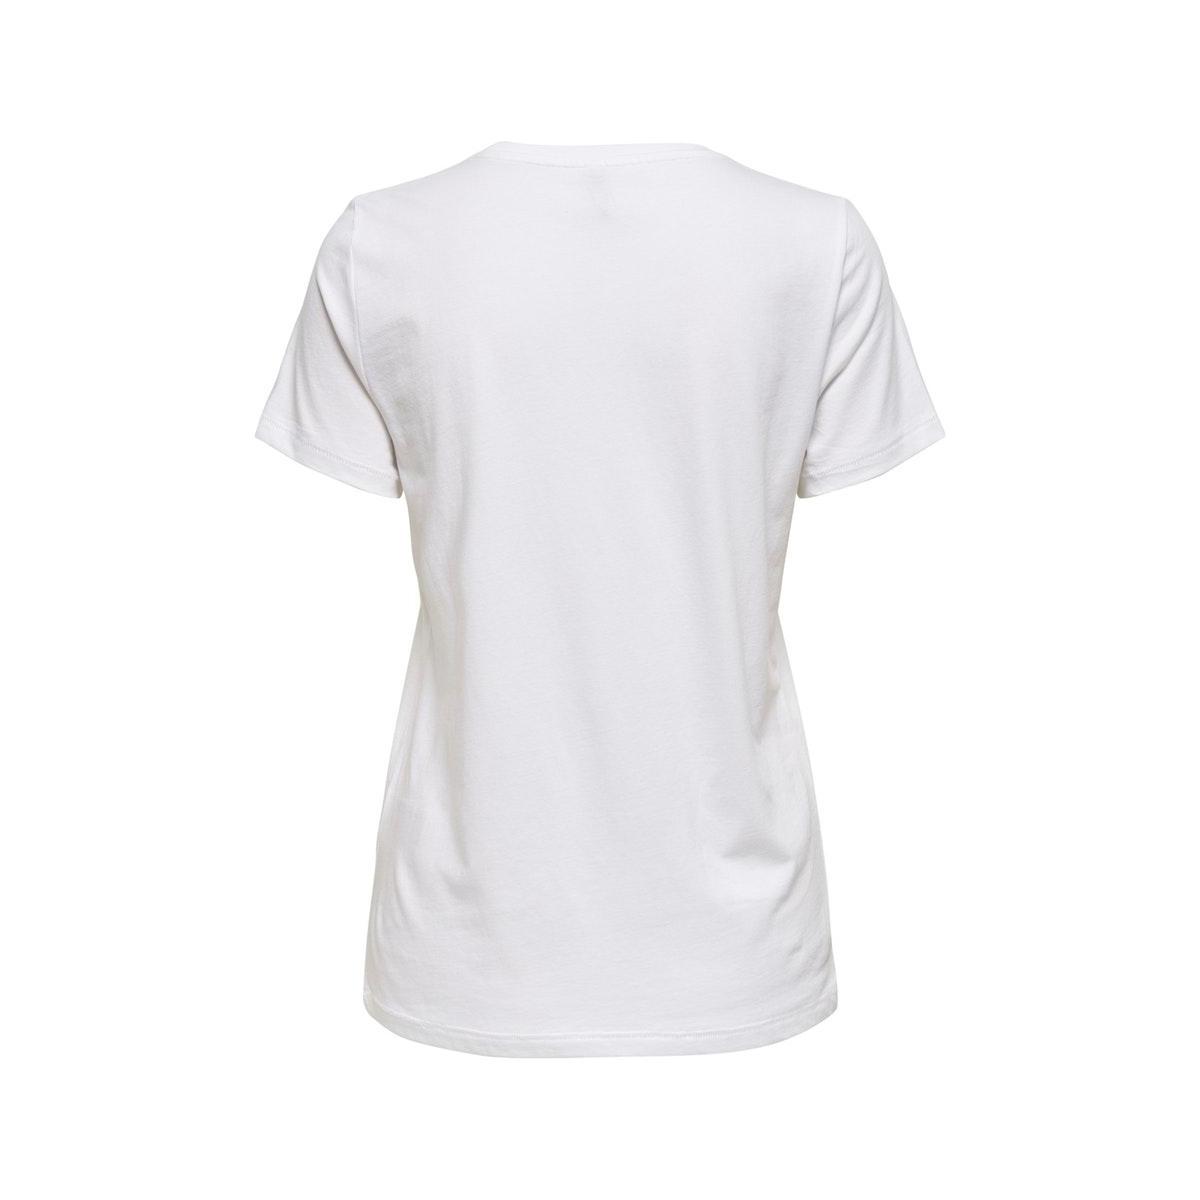 onlkia life reg s/s top box jrs 15206154 only t-shirt bricht white/strong